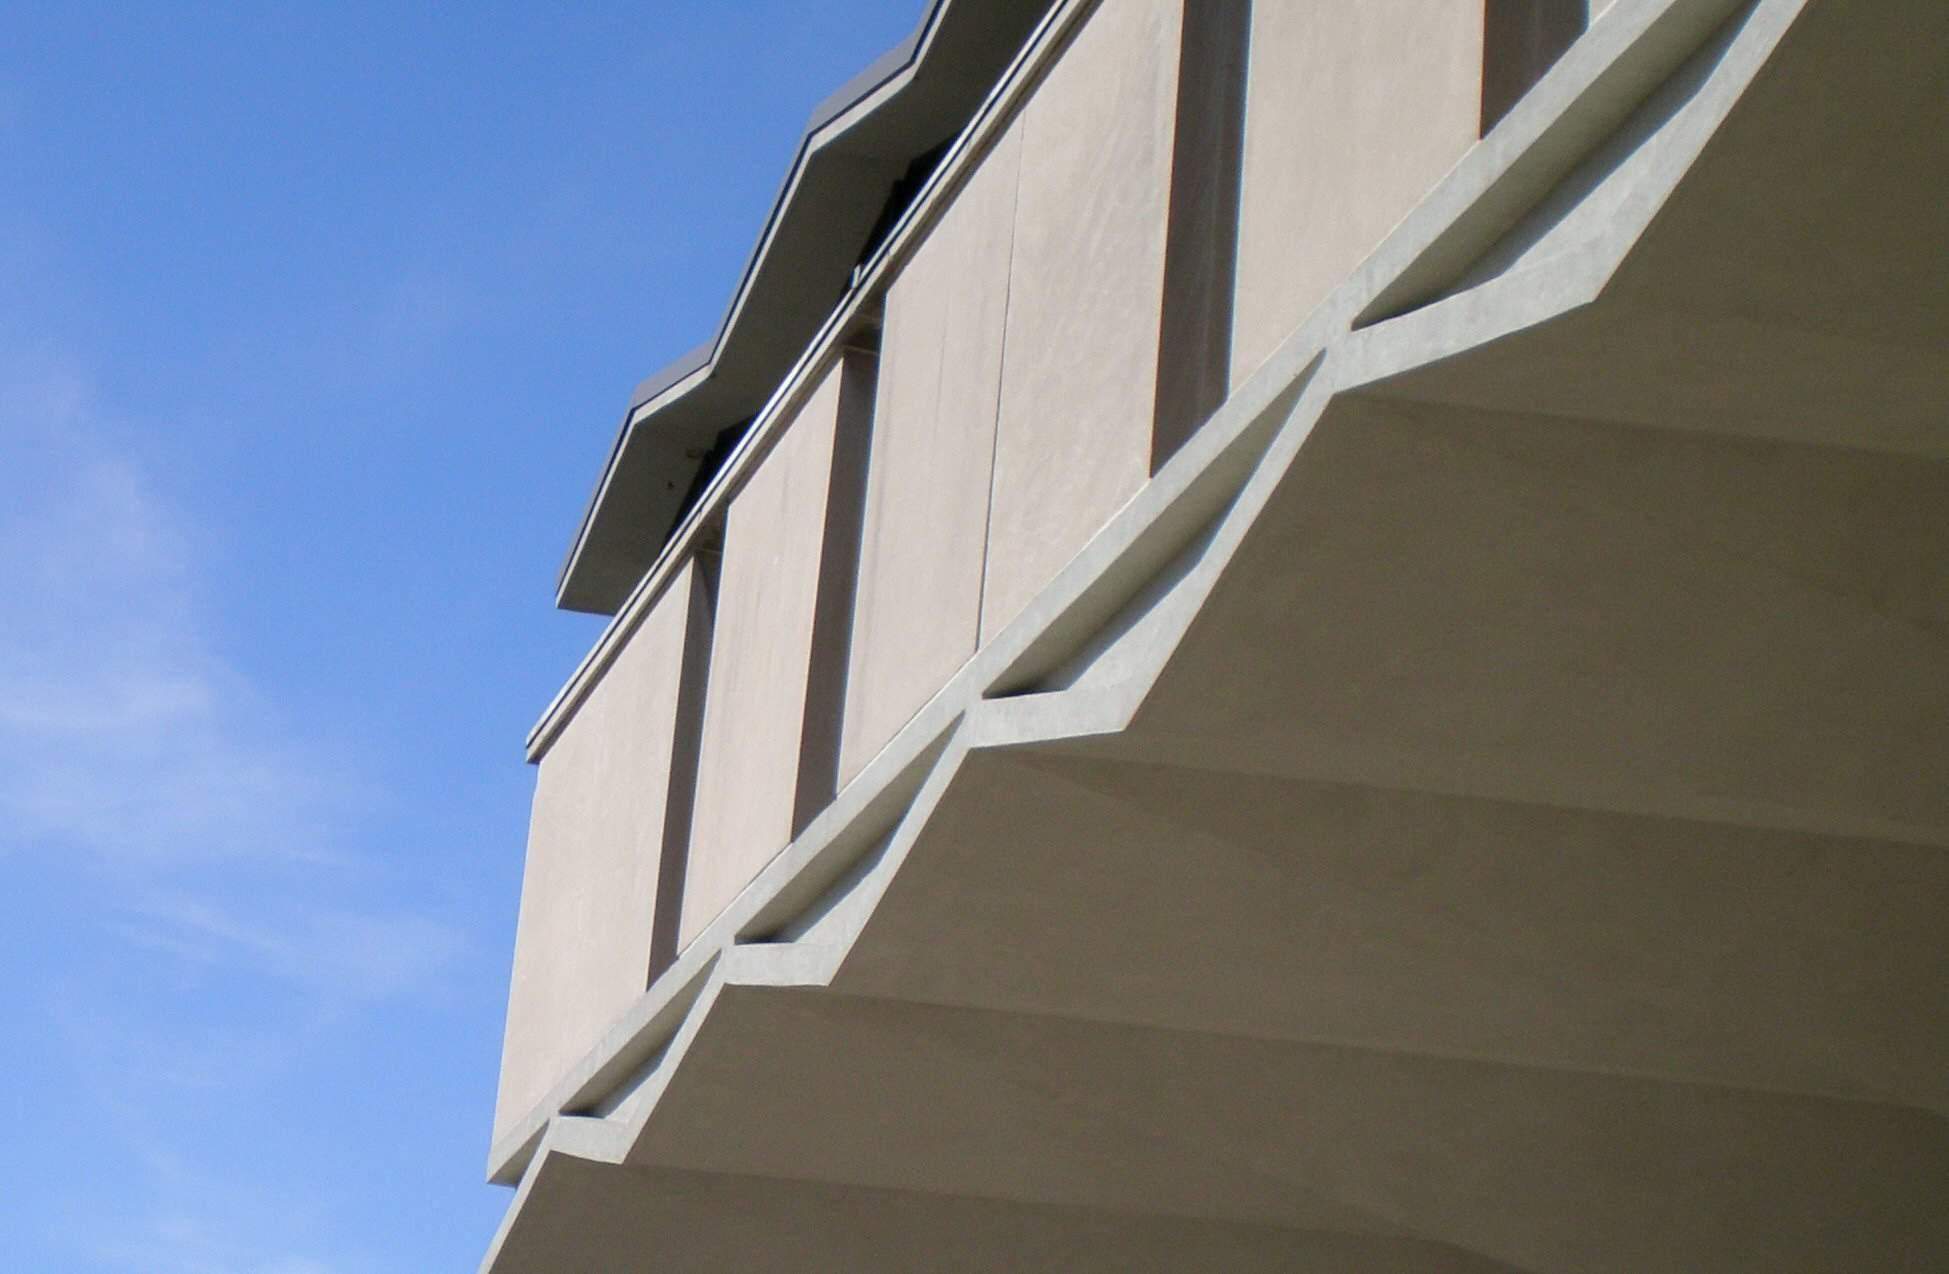 Detalle de la línea del techo, Steinberg Hall, Universidad de Washington, St. Louis